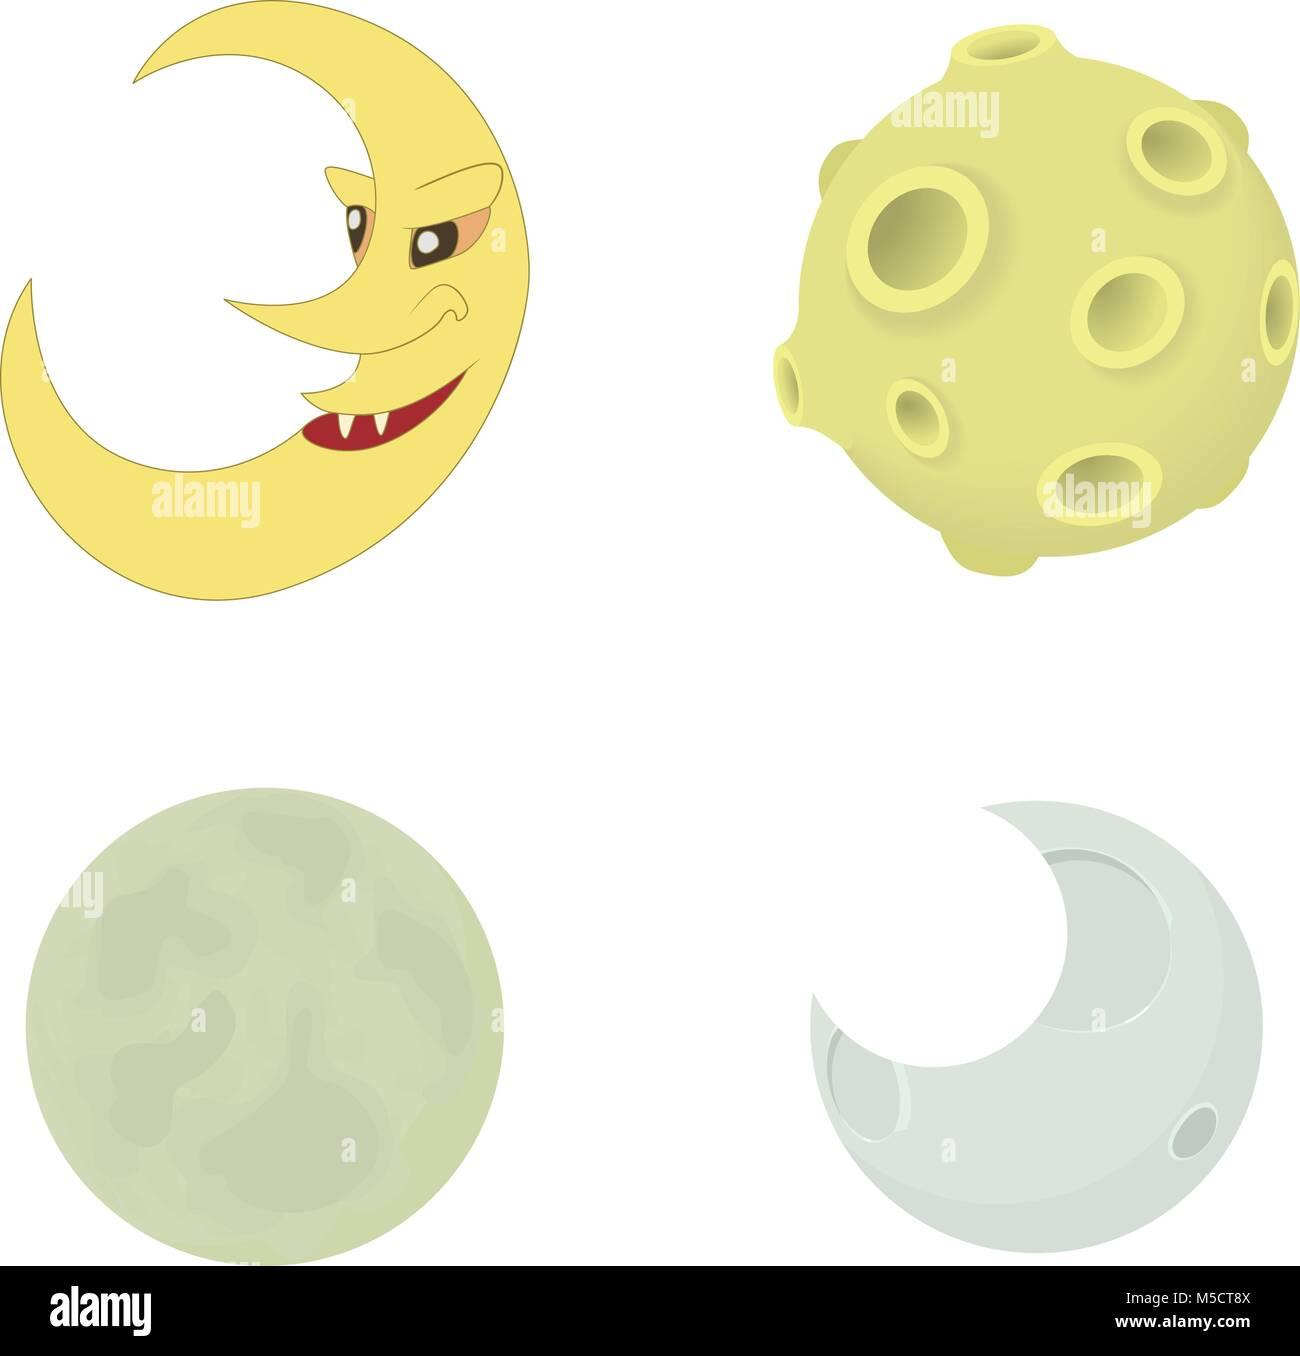 Moon icon set, cartoon style - Stock Image